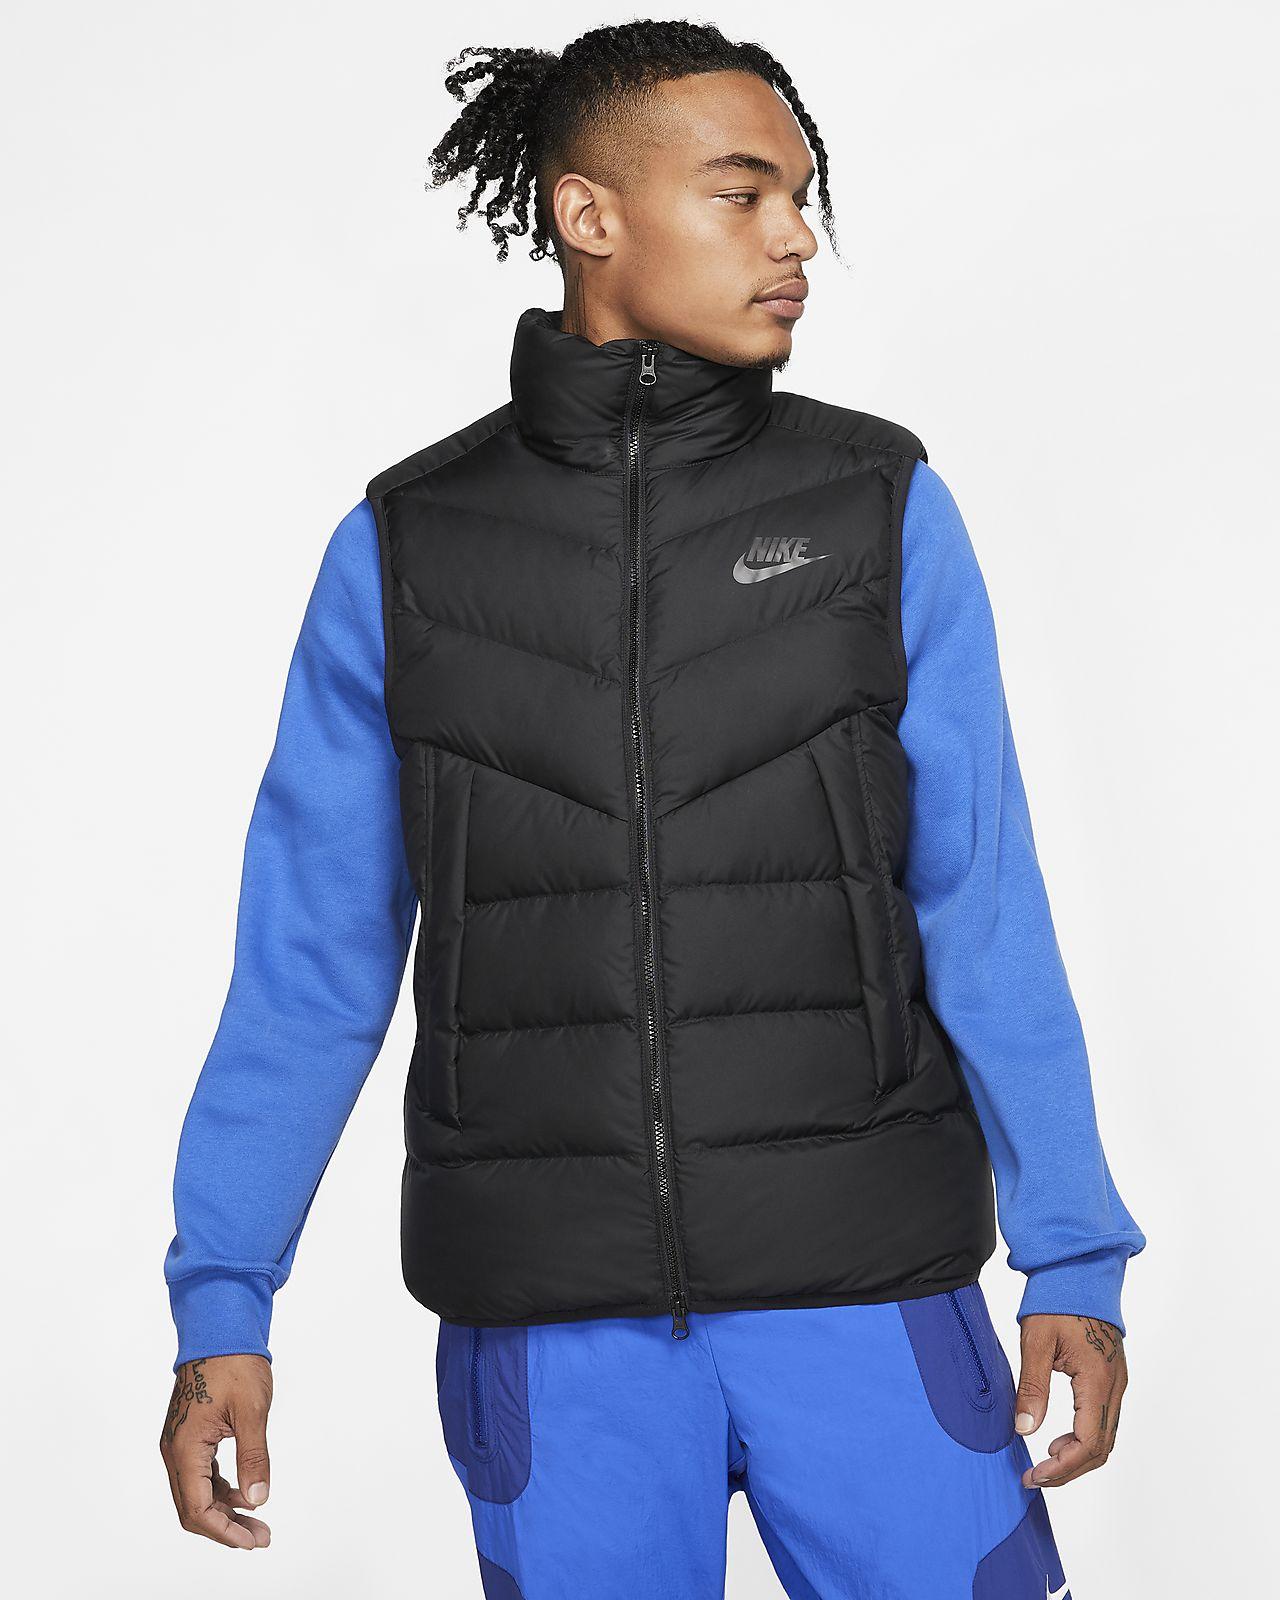 Nike Sportswear Bodywarmer met donsvulling voor heren